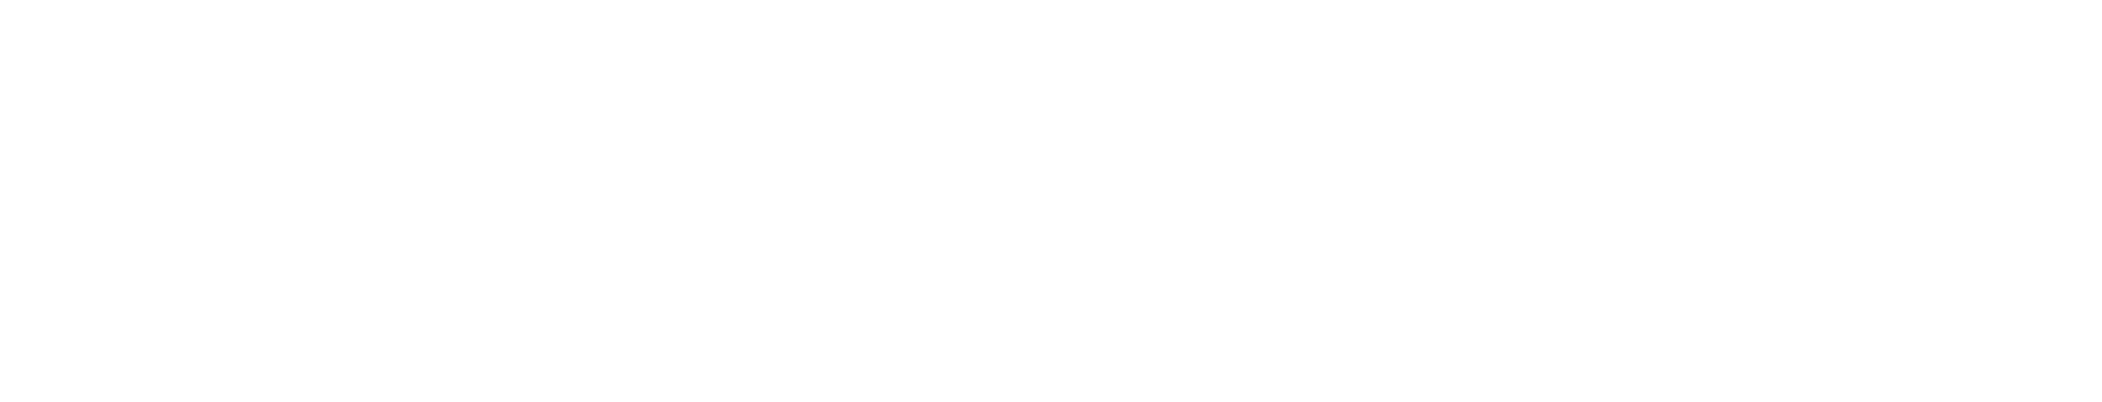 services-critiques-icone